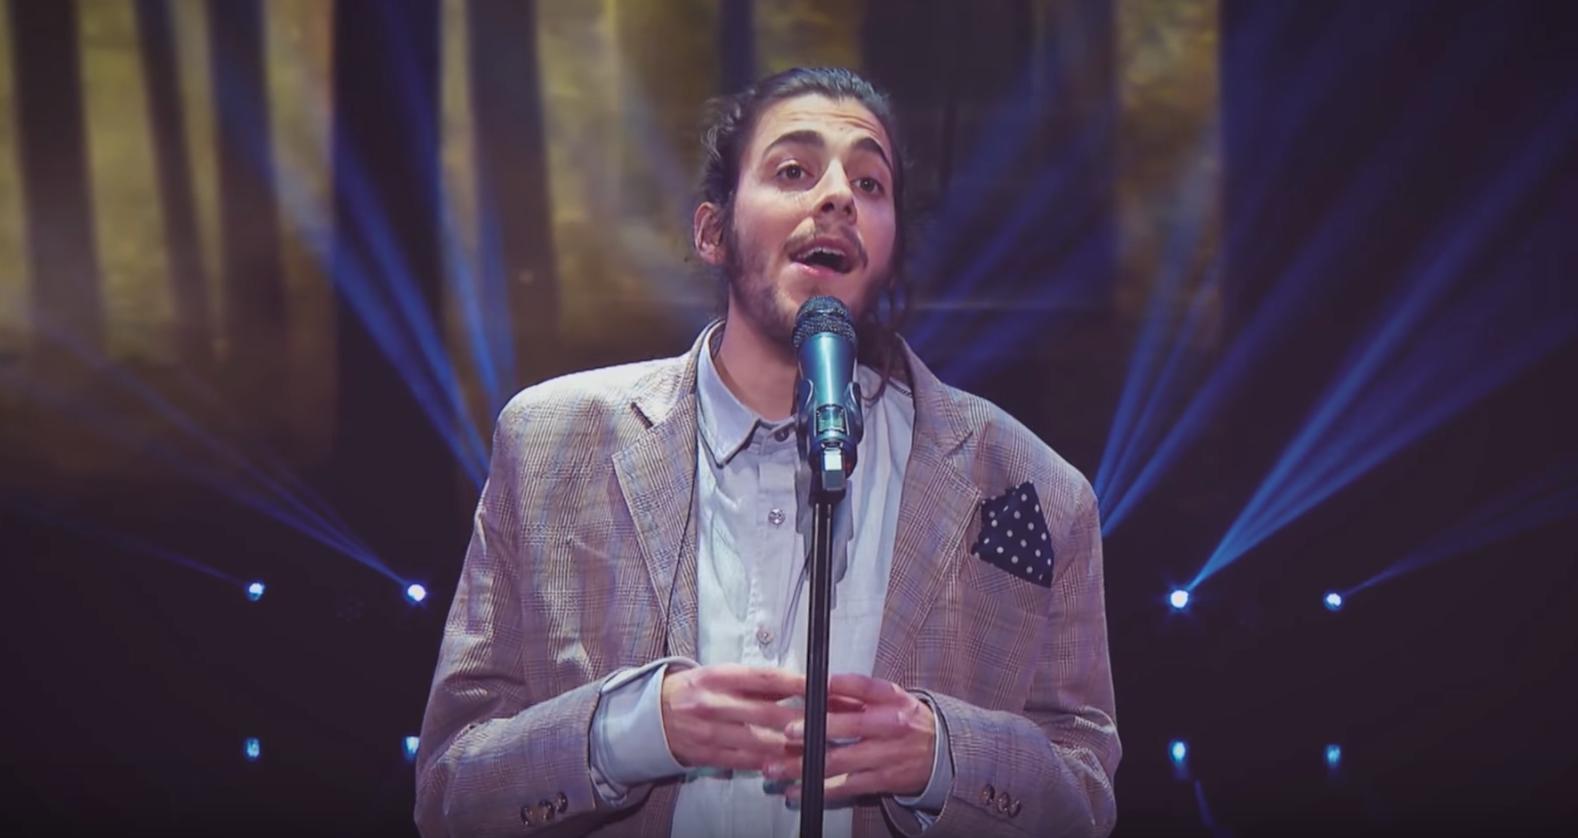 Eurovision 2017 - Portugal's Salvador Sobral performs screen grab